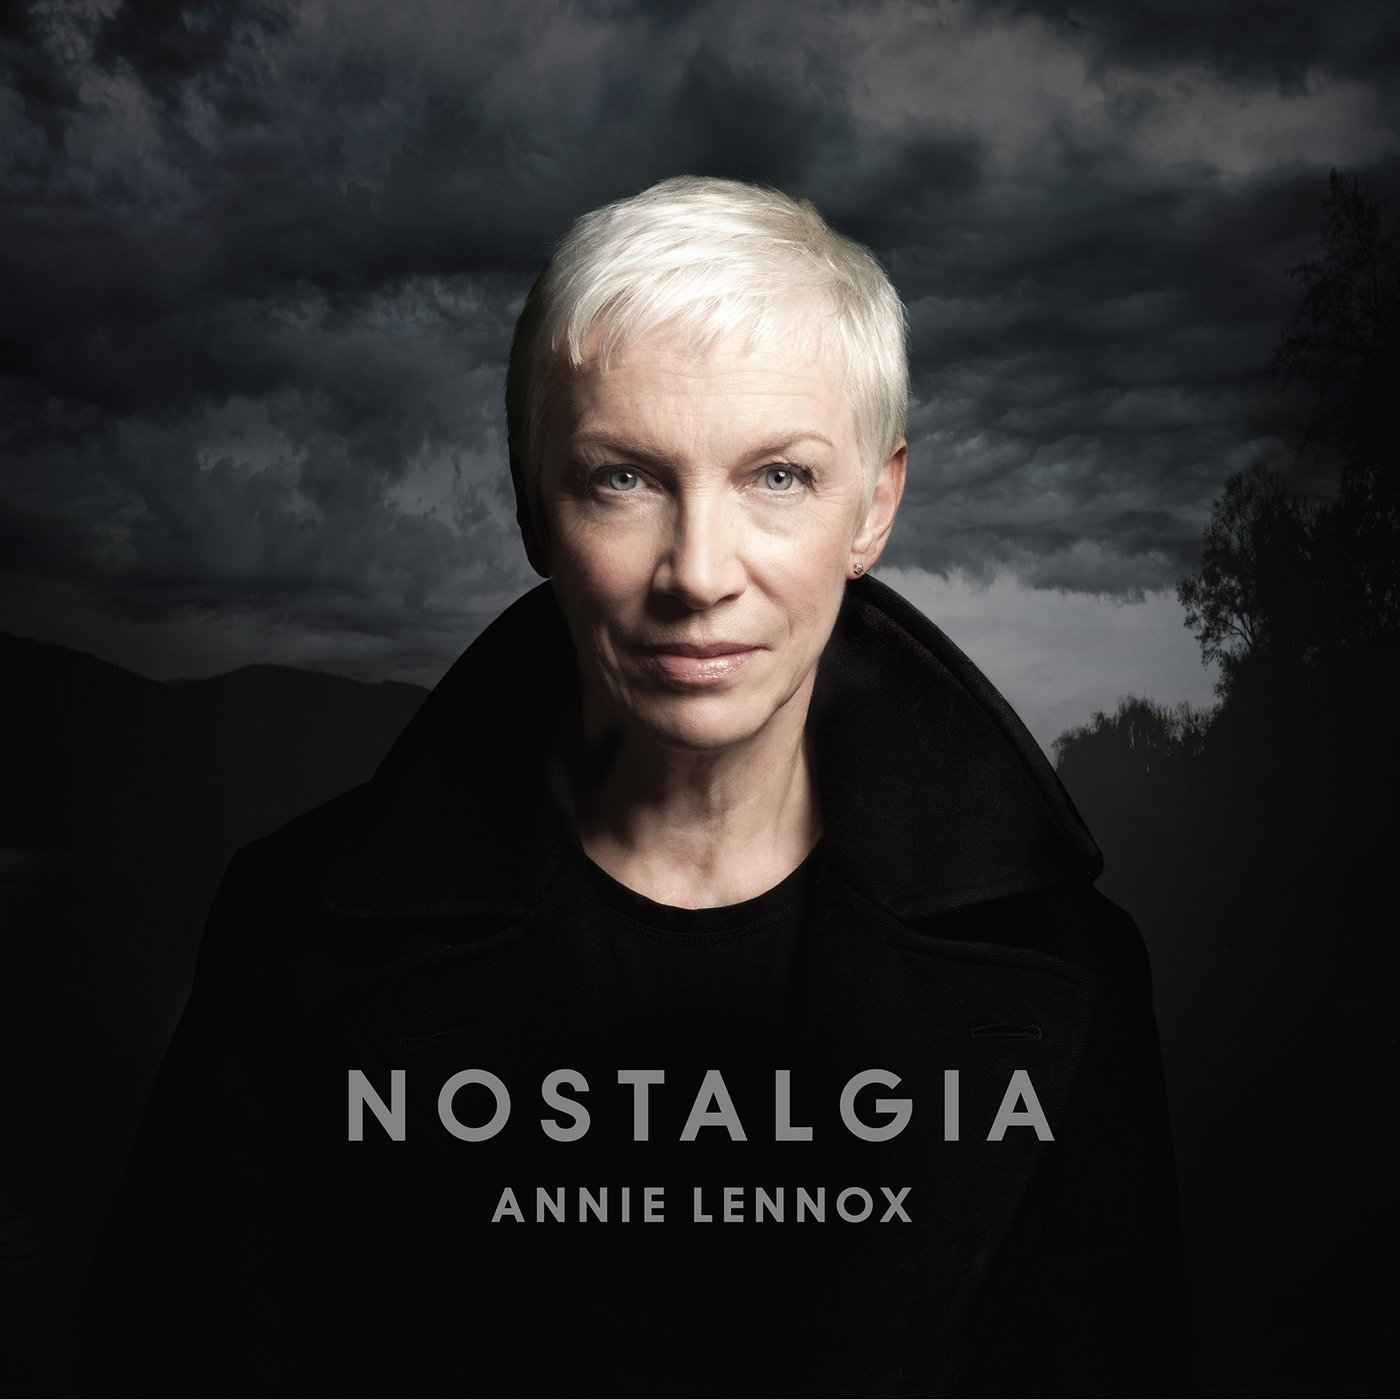 Nostalgia / Annie Lennox, chant |